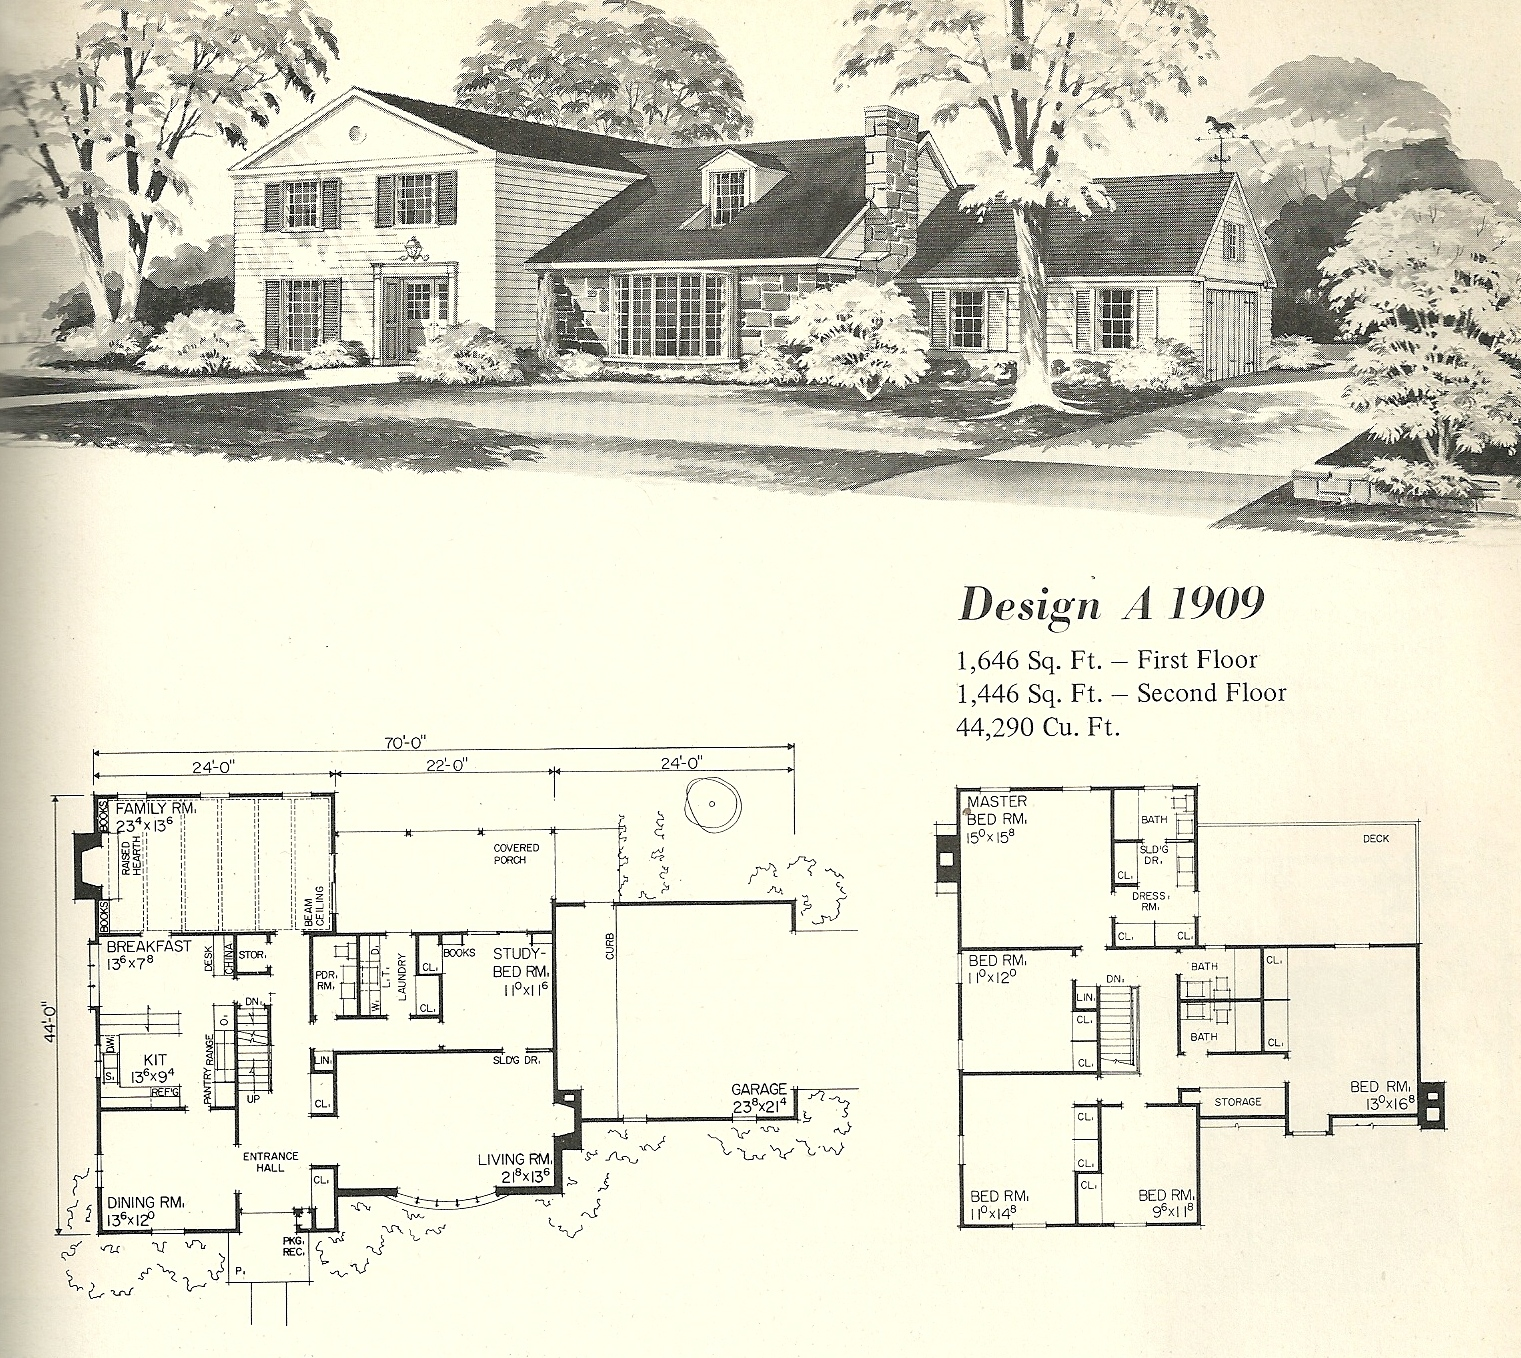 Vintage house plans 1909 antique alter ego for Antique colonial house plans